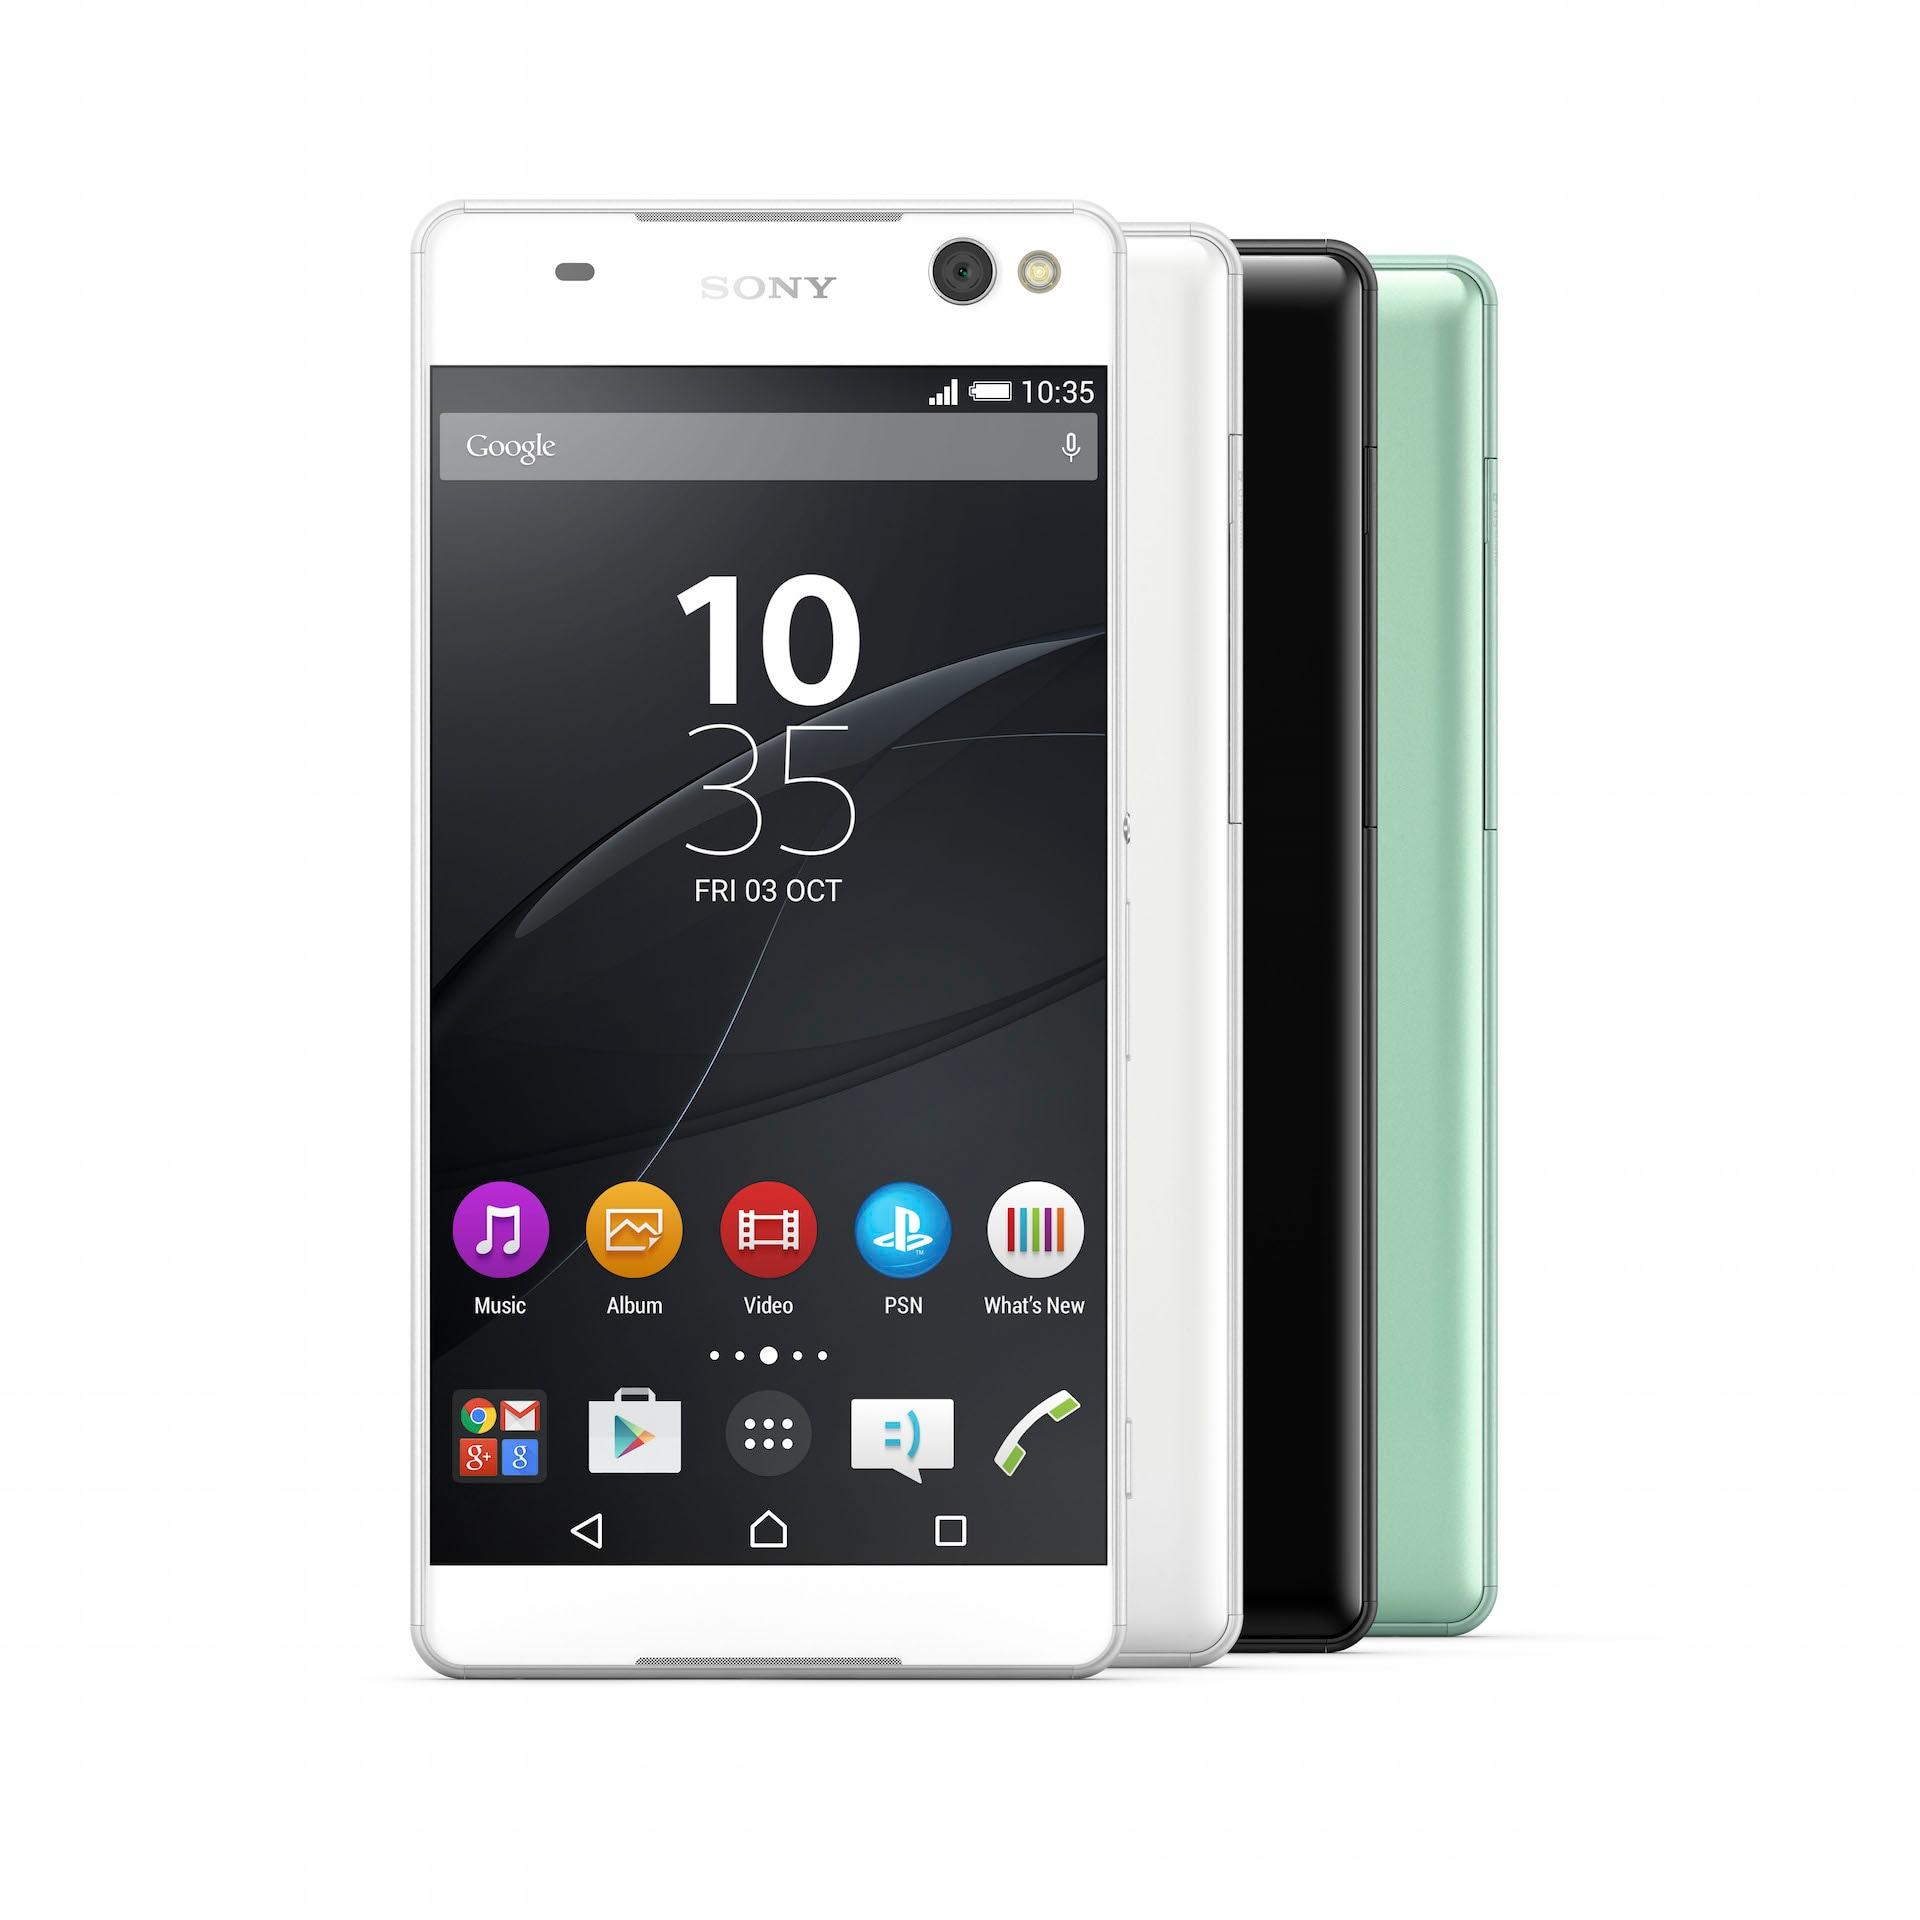 Sony Xperia C5 Ultra render ufficiale – 1